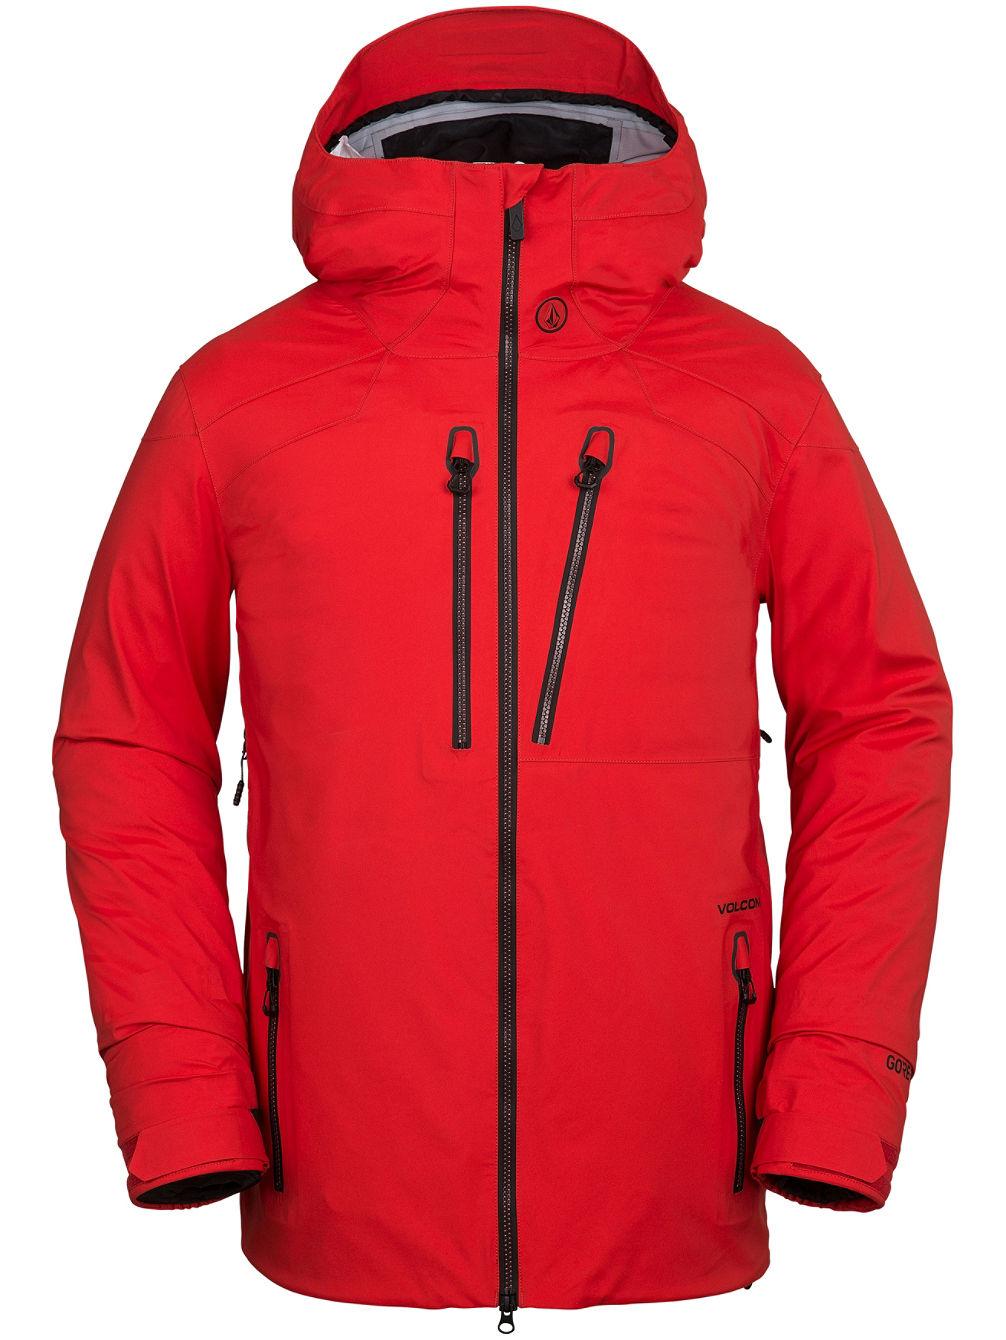 Kup Volcom Guch Strtch Gore-Tex Jacket online na blue-tomato.com c29f0a86478